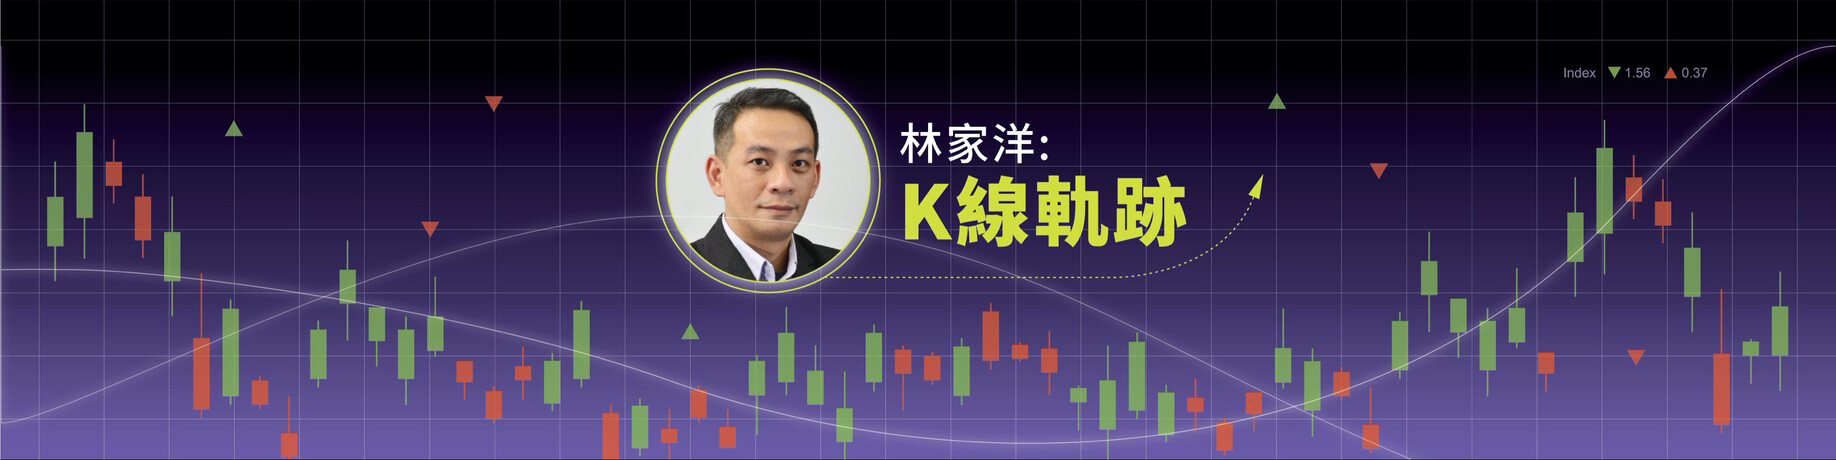 林家洋:K線軌跡